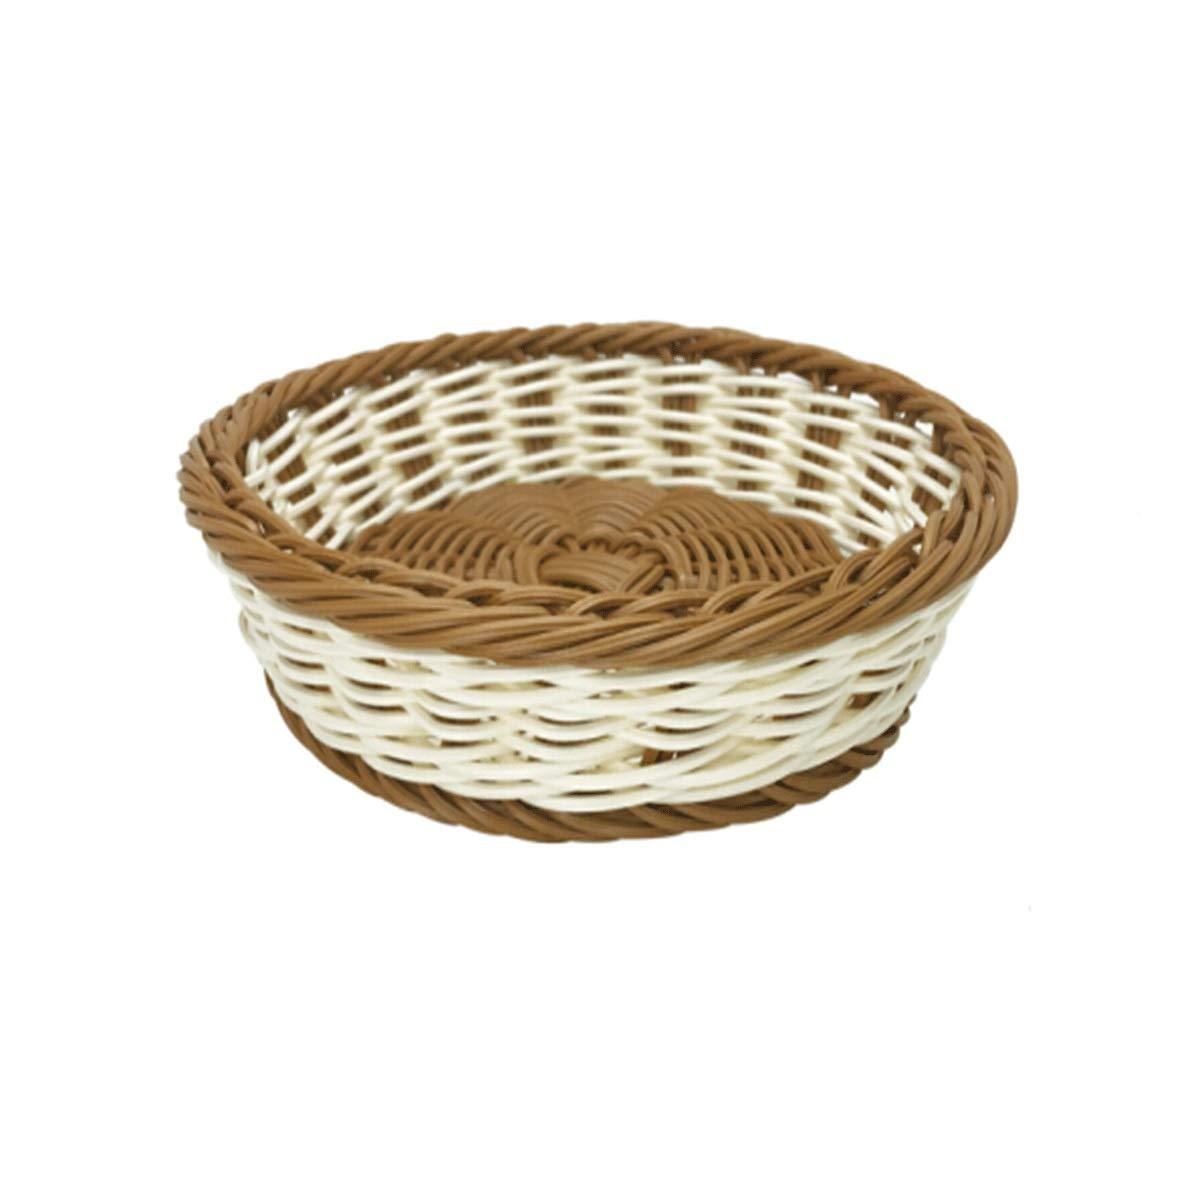 Tongboshi Fruit Basket, Rattan Living Room Creative Fruit Bowl, Bread Basket, Tray Storage Basket, Dried Fruit Basket, Baking Snack Basket, Rice Coffee Two-Color Latest Models (Size : XL)